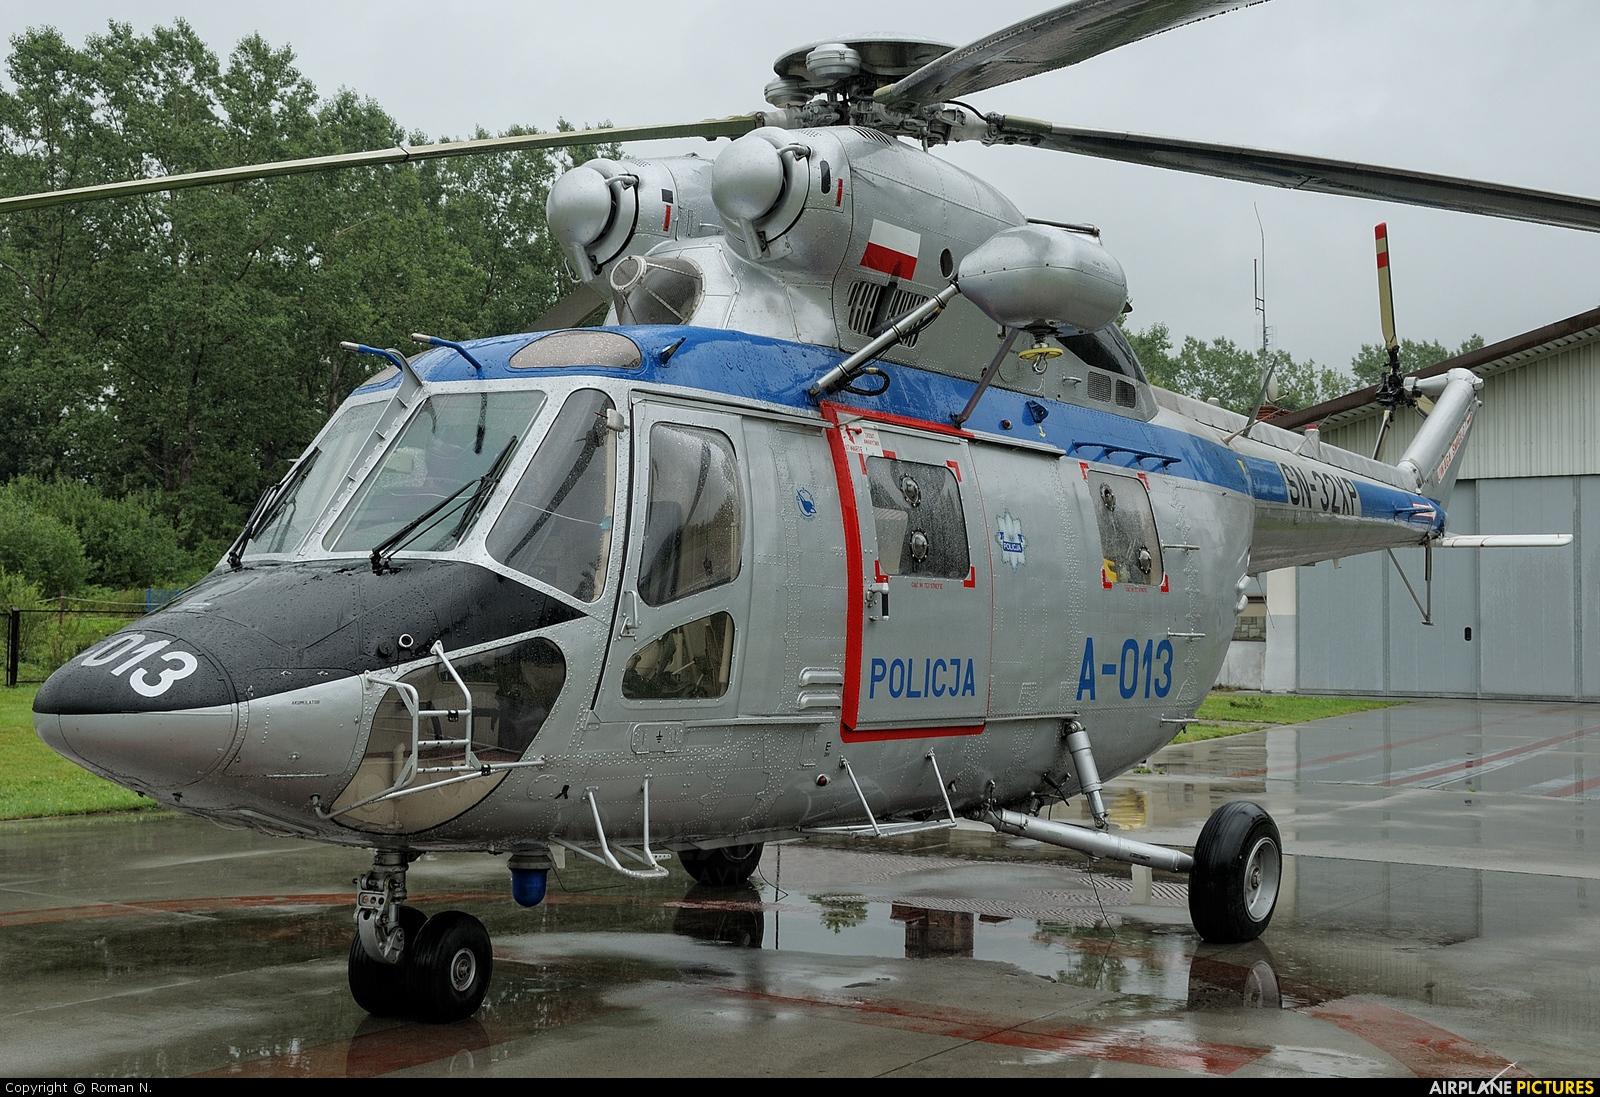 Poland - Police SN-32XP aircraft at Off Airport - Poland